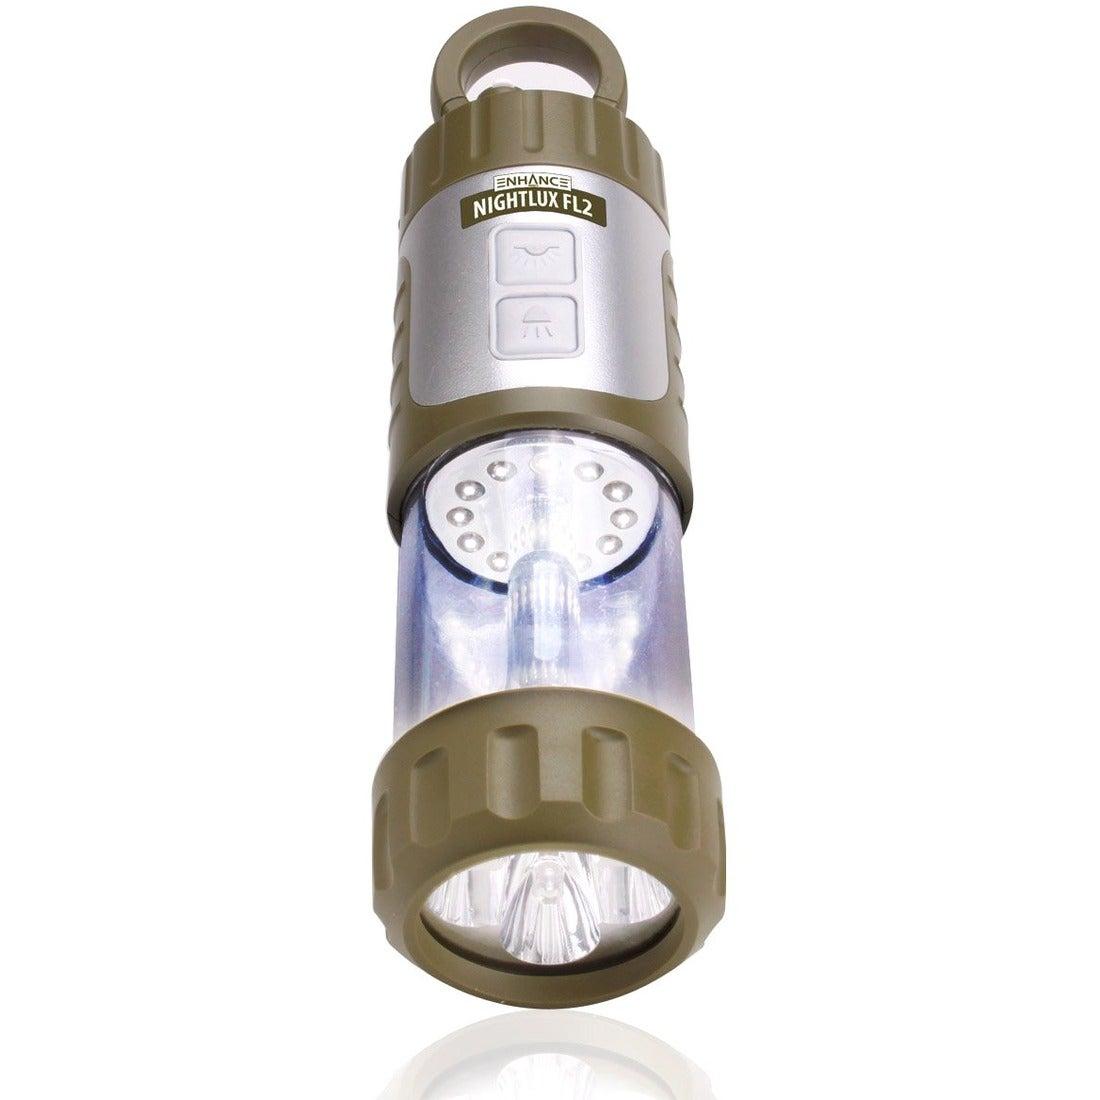 Enhance Technology Nightlux FL2 Camping Lantern & LED Fla...